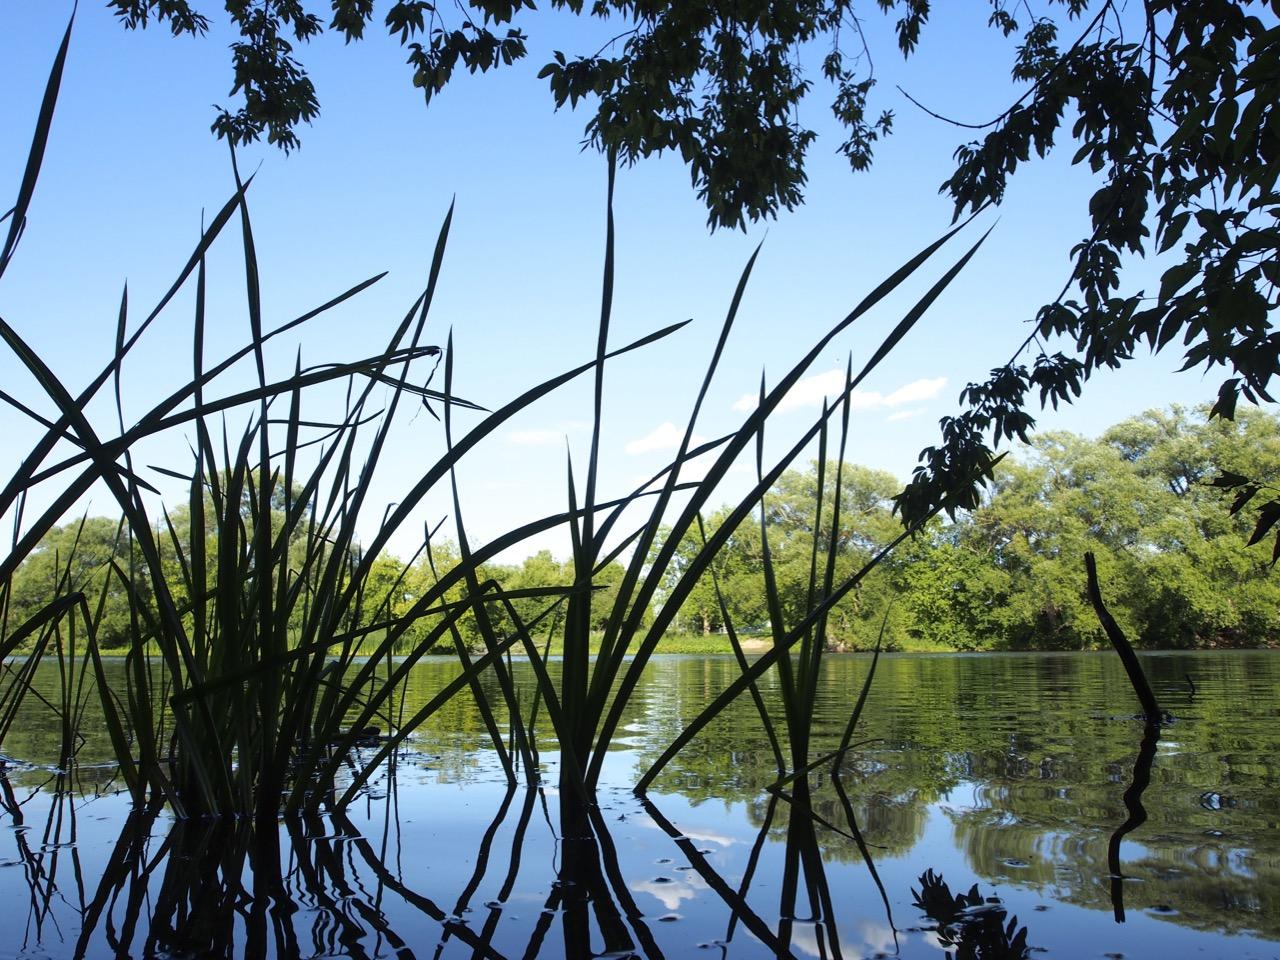 P8237880 - Rideau River, Strathcona Park